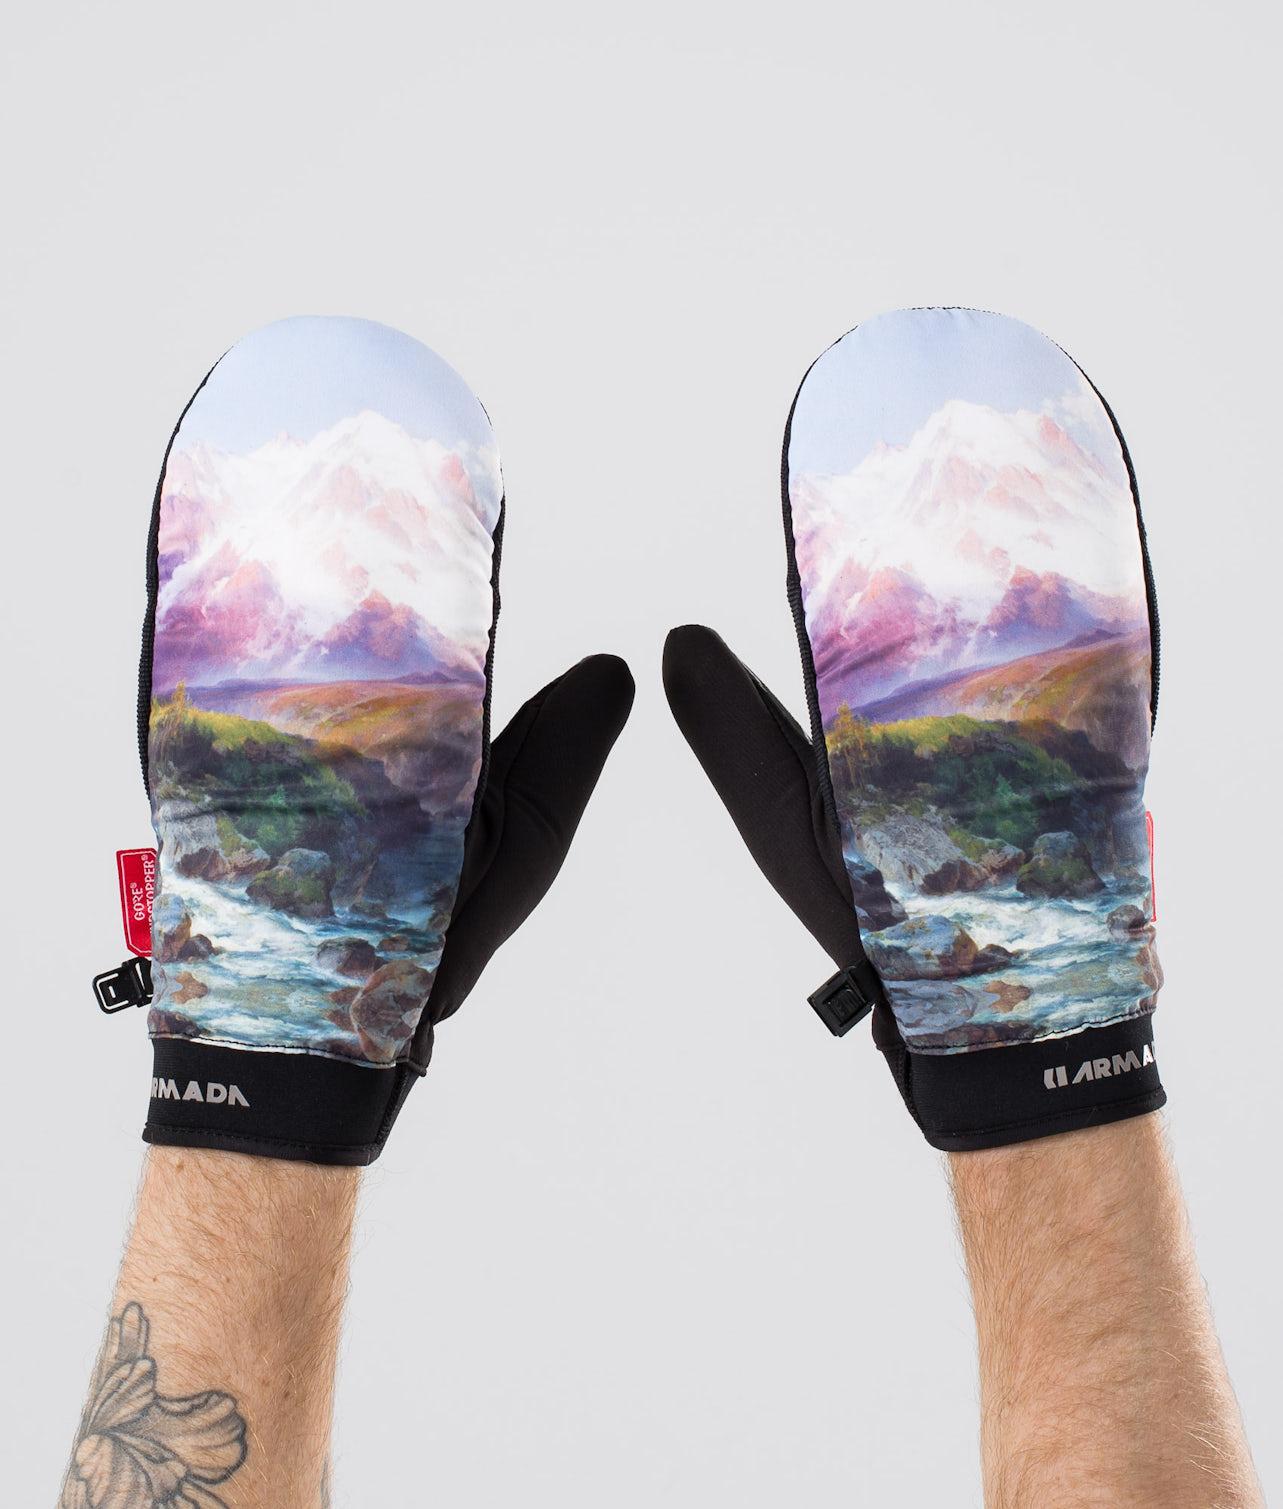 Buy Carmel Ski Gloves from Armada at Ridestore.com - Always free shipping, free returns and 30 days money back guarantee